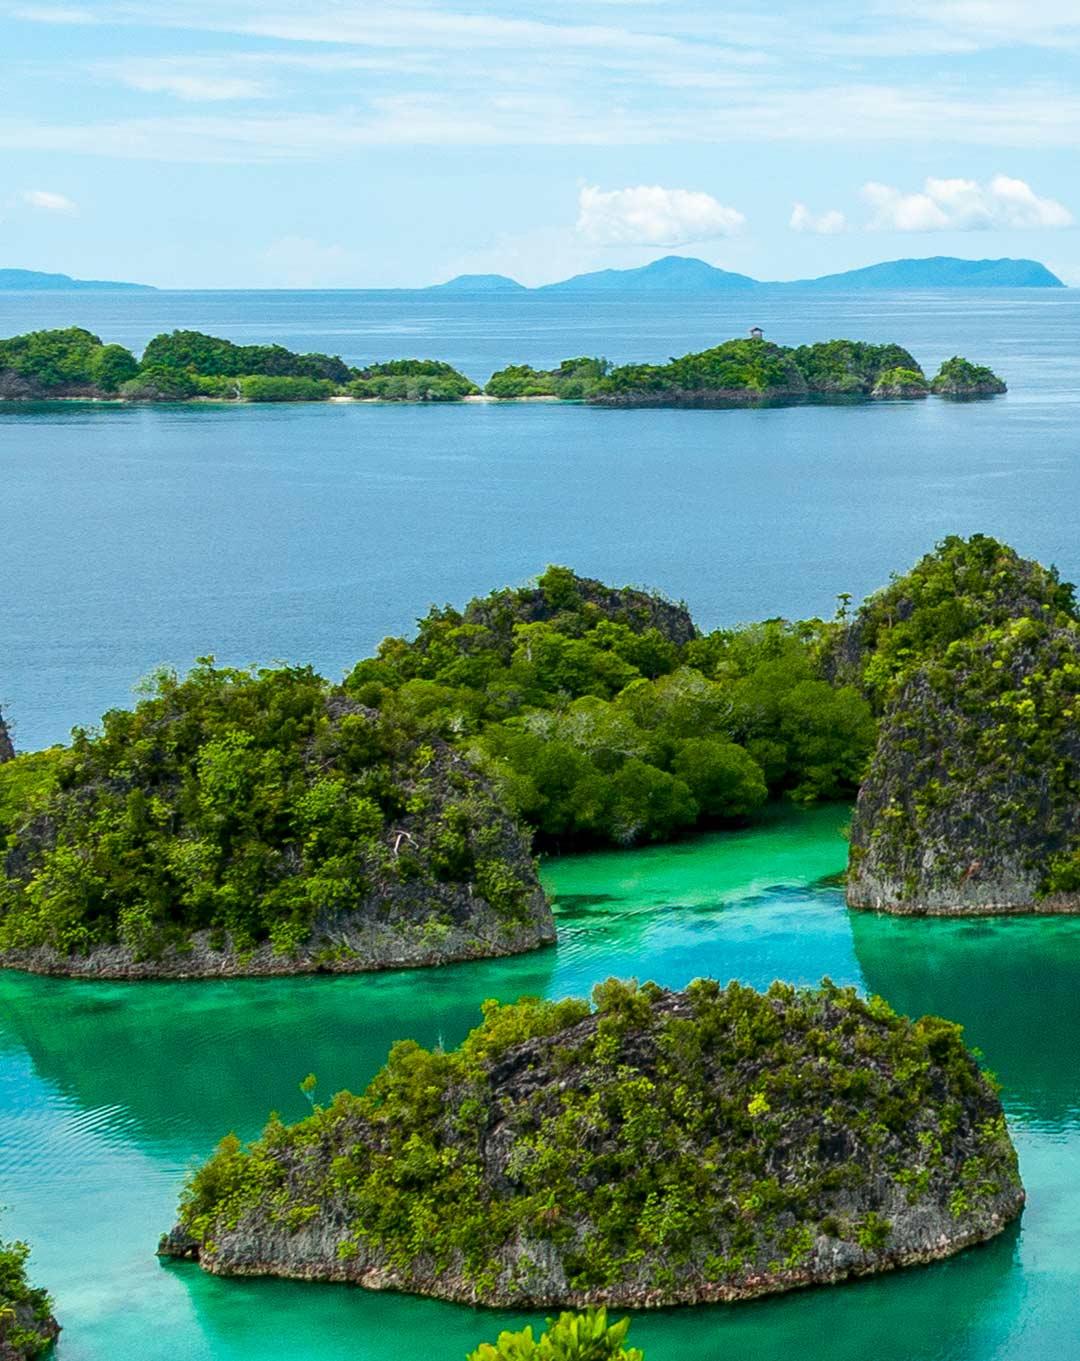 Raja Ampat Fam Islands